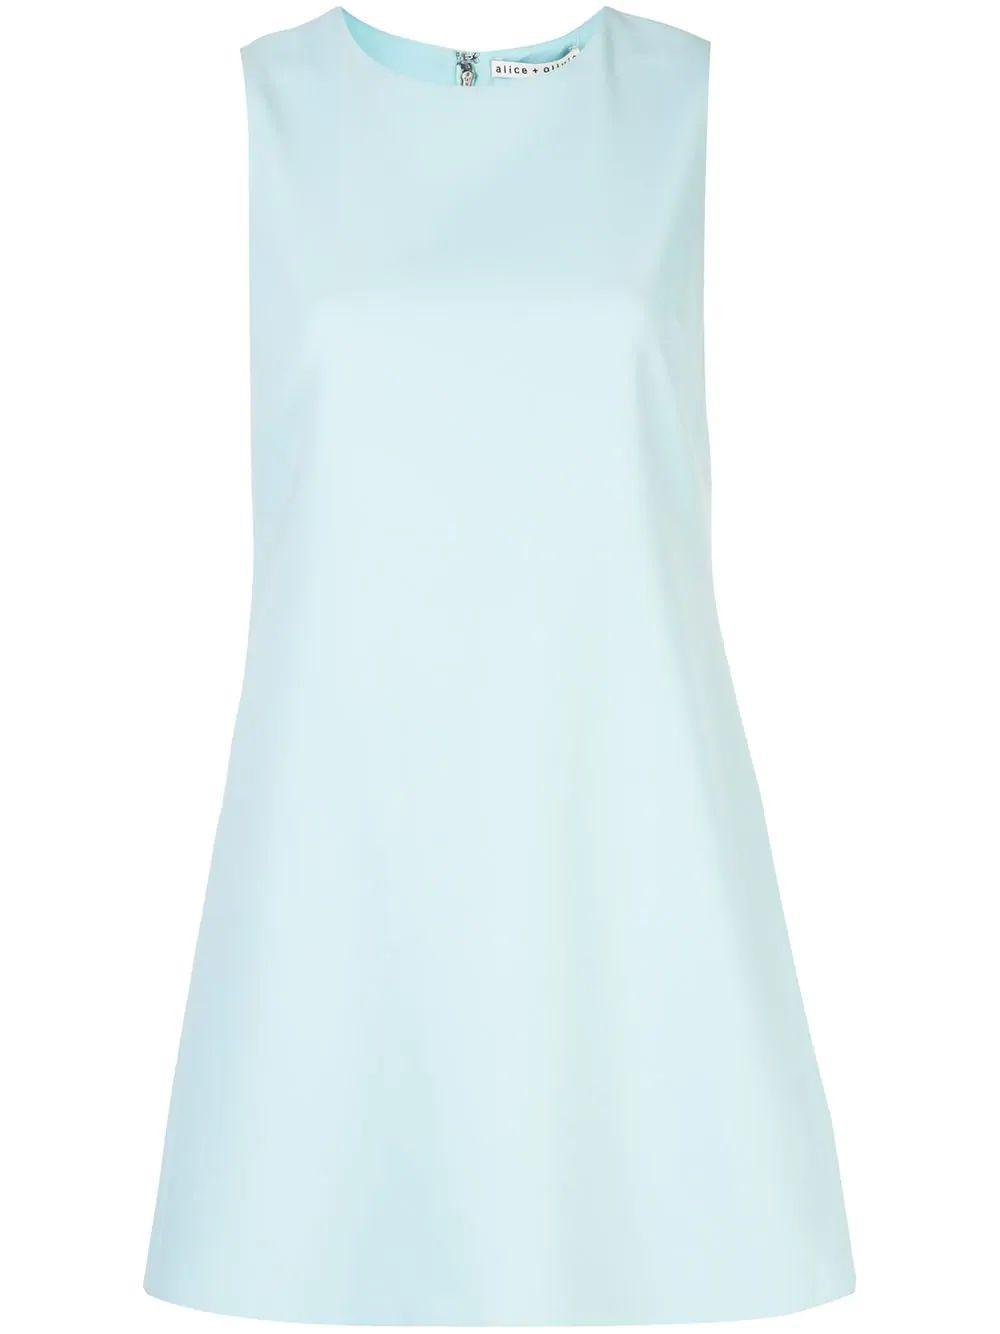 Coley Crew Neck Aline Dress Item # CC003202568-C